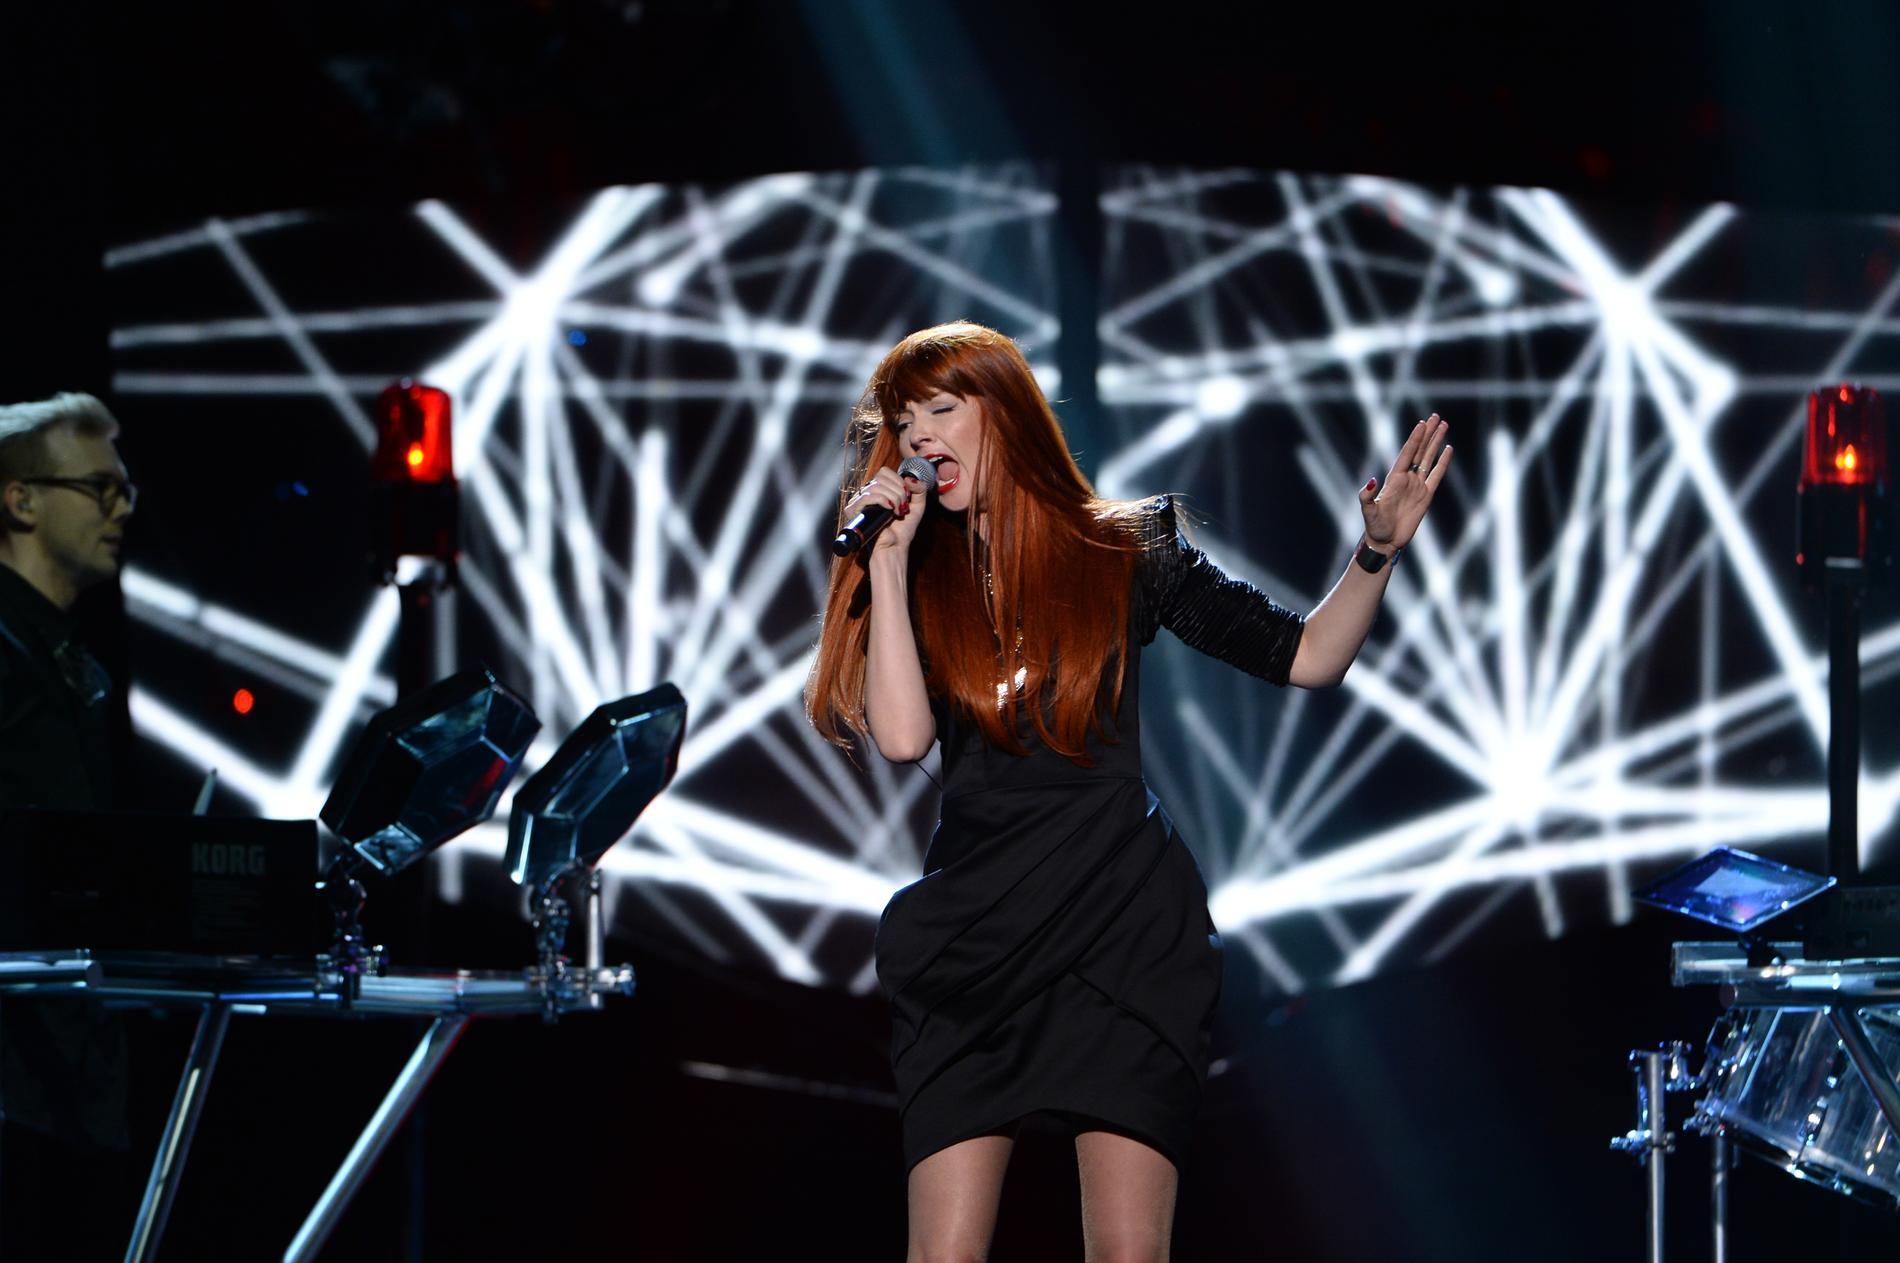 Anna Lidman sjöng i gruppen EKO i Melodifestivalen 2014